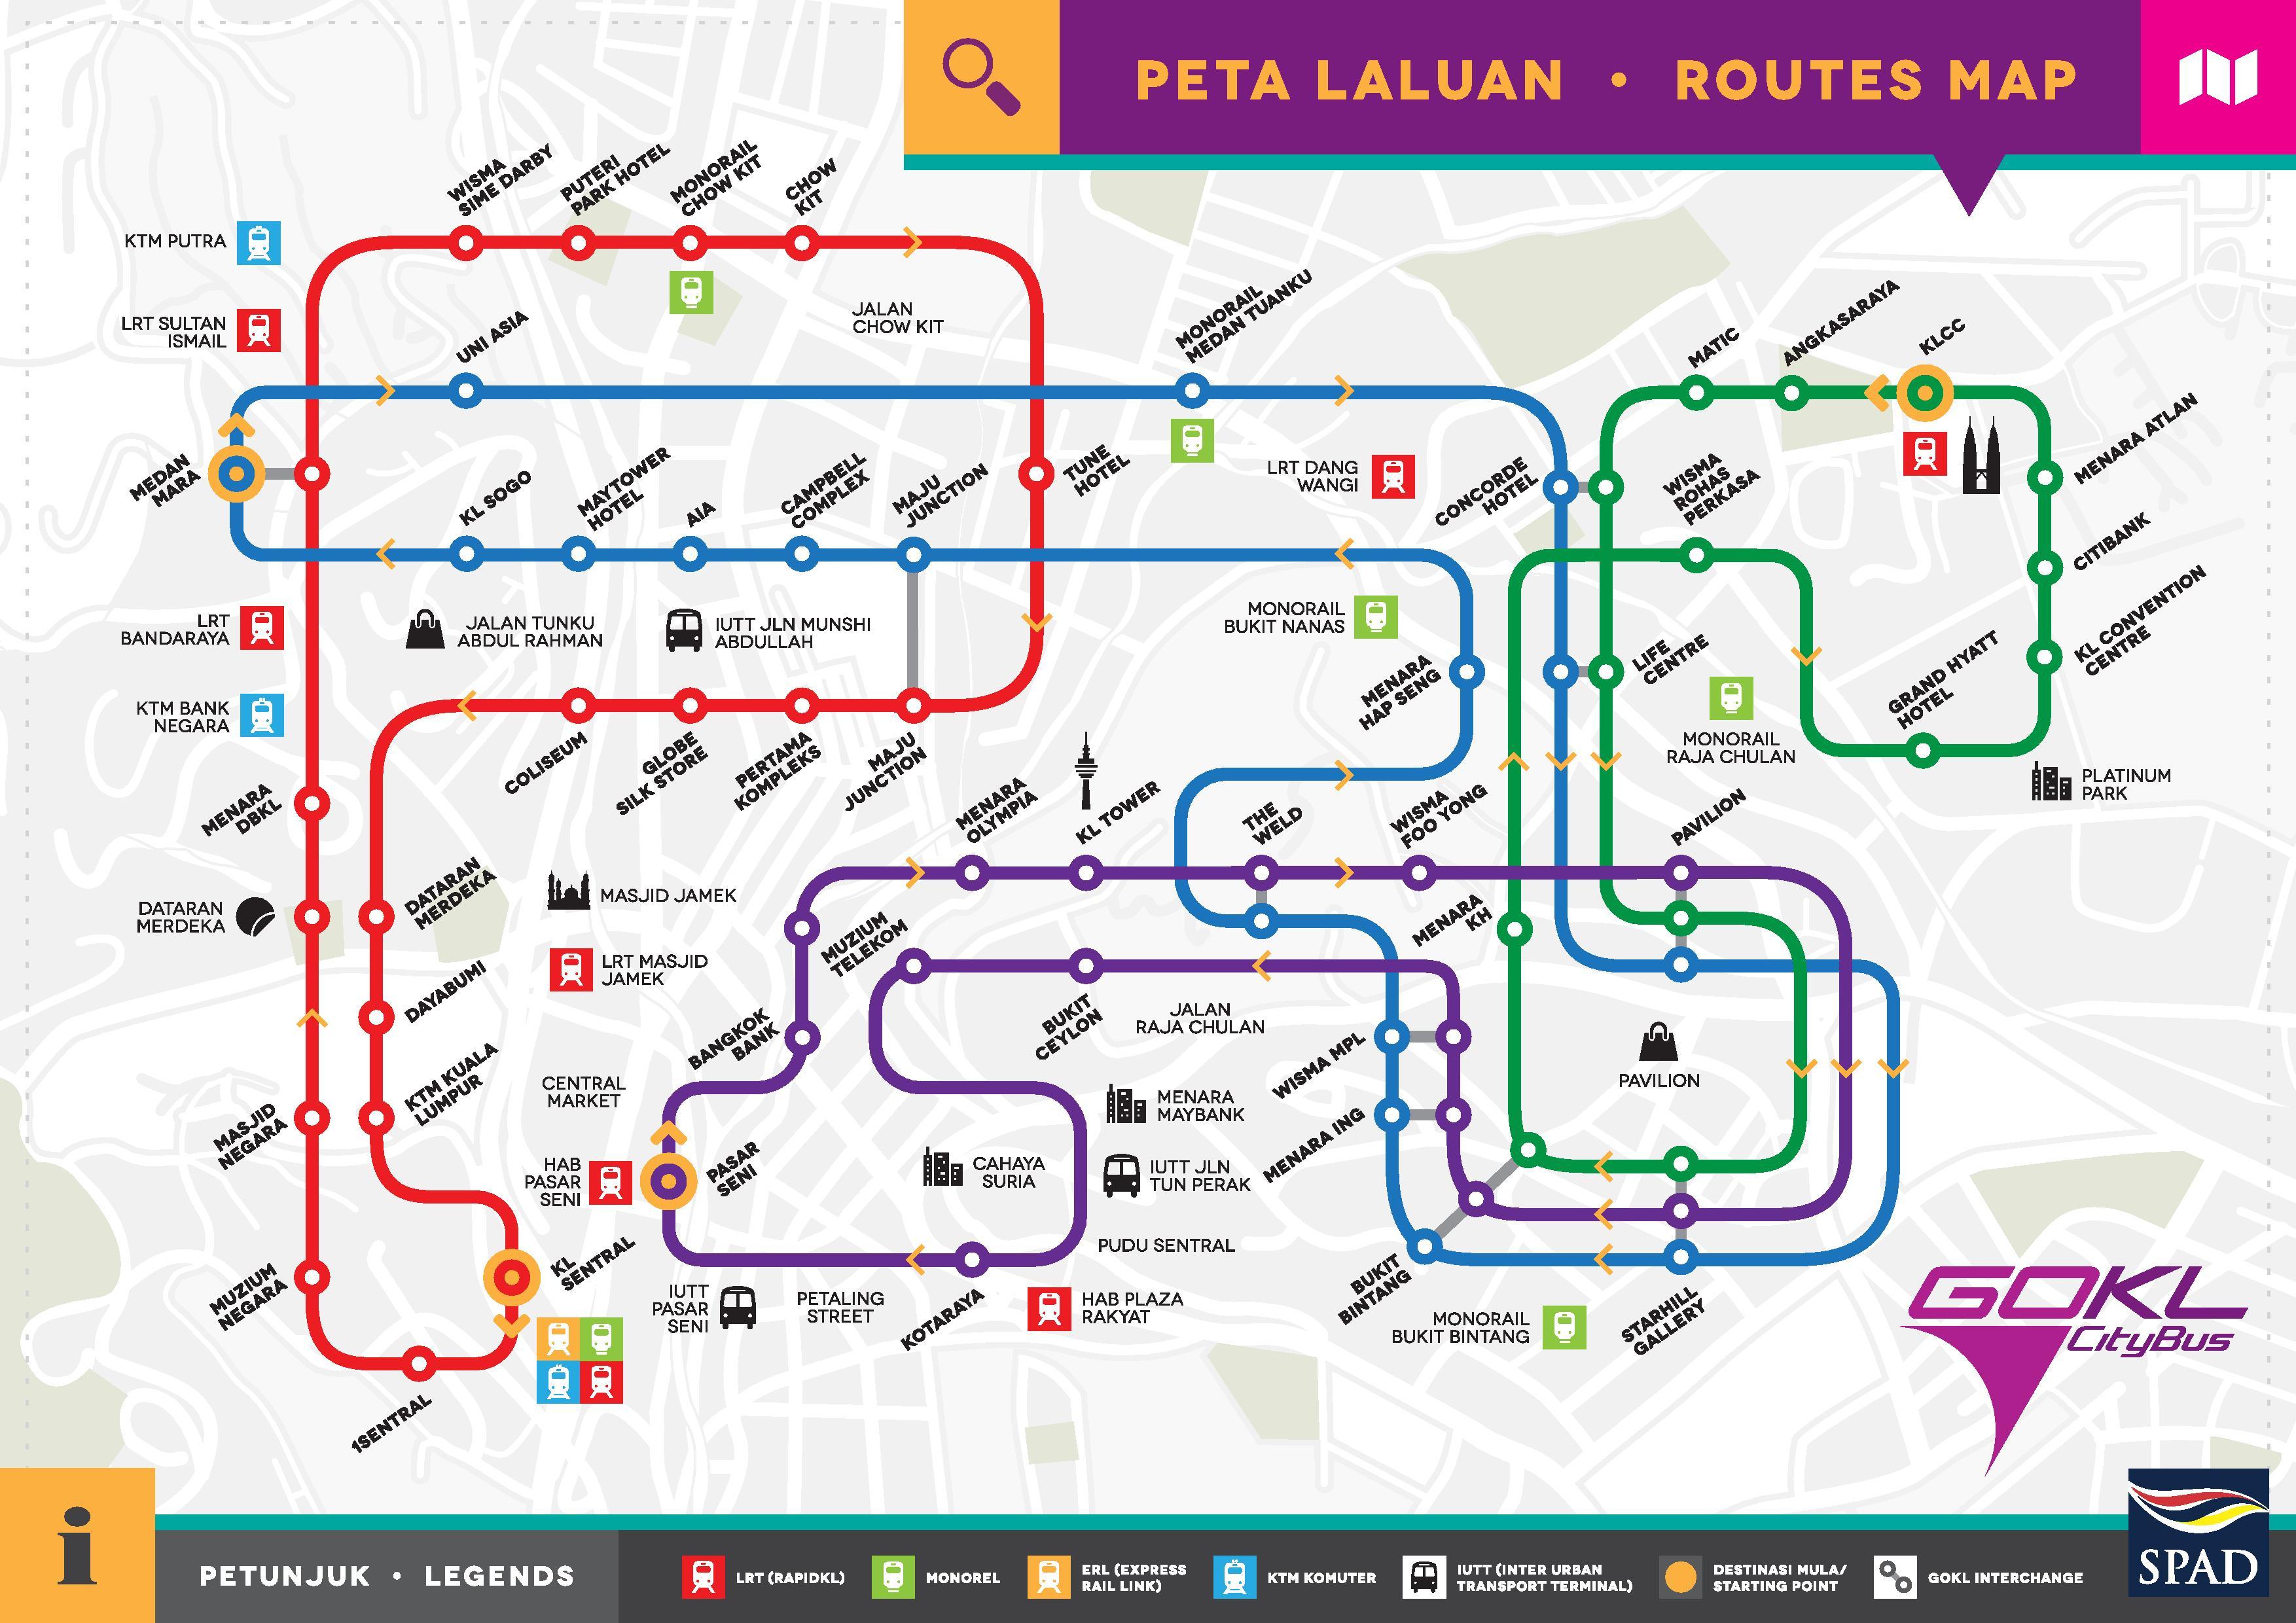 Kuala Lumpur Peta Laluan GOKL City Bus map